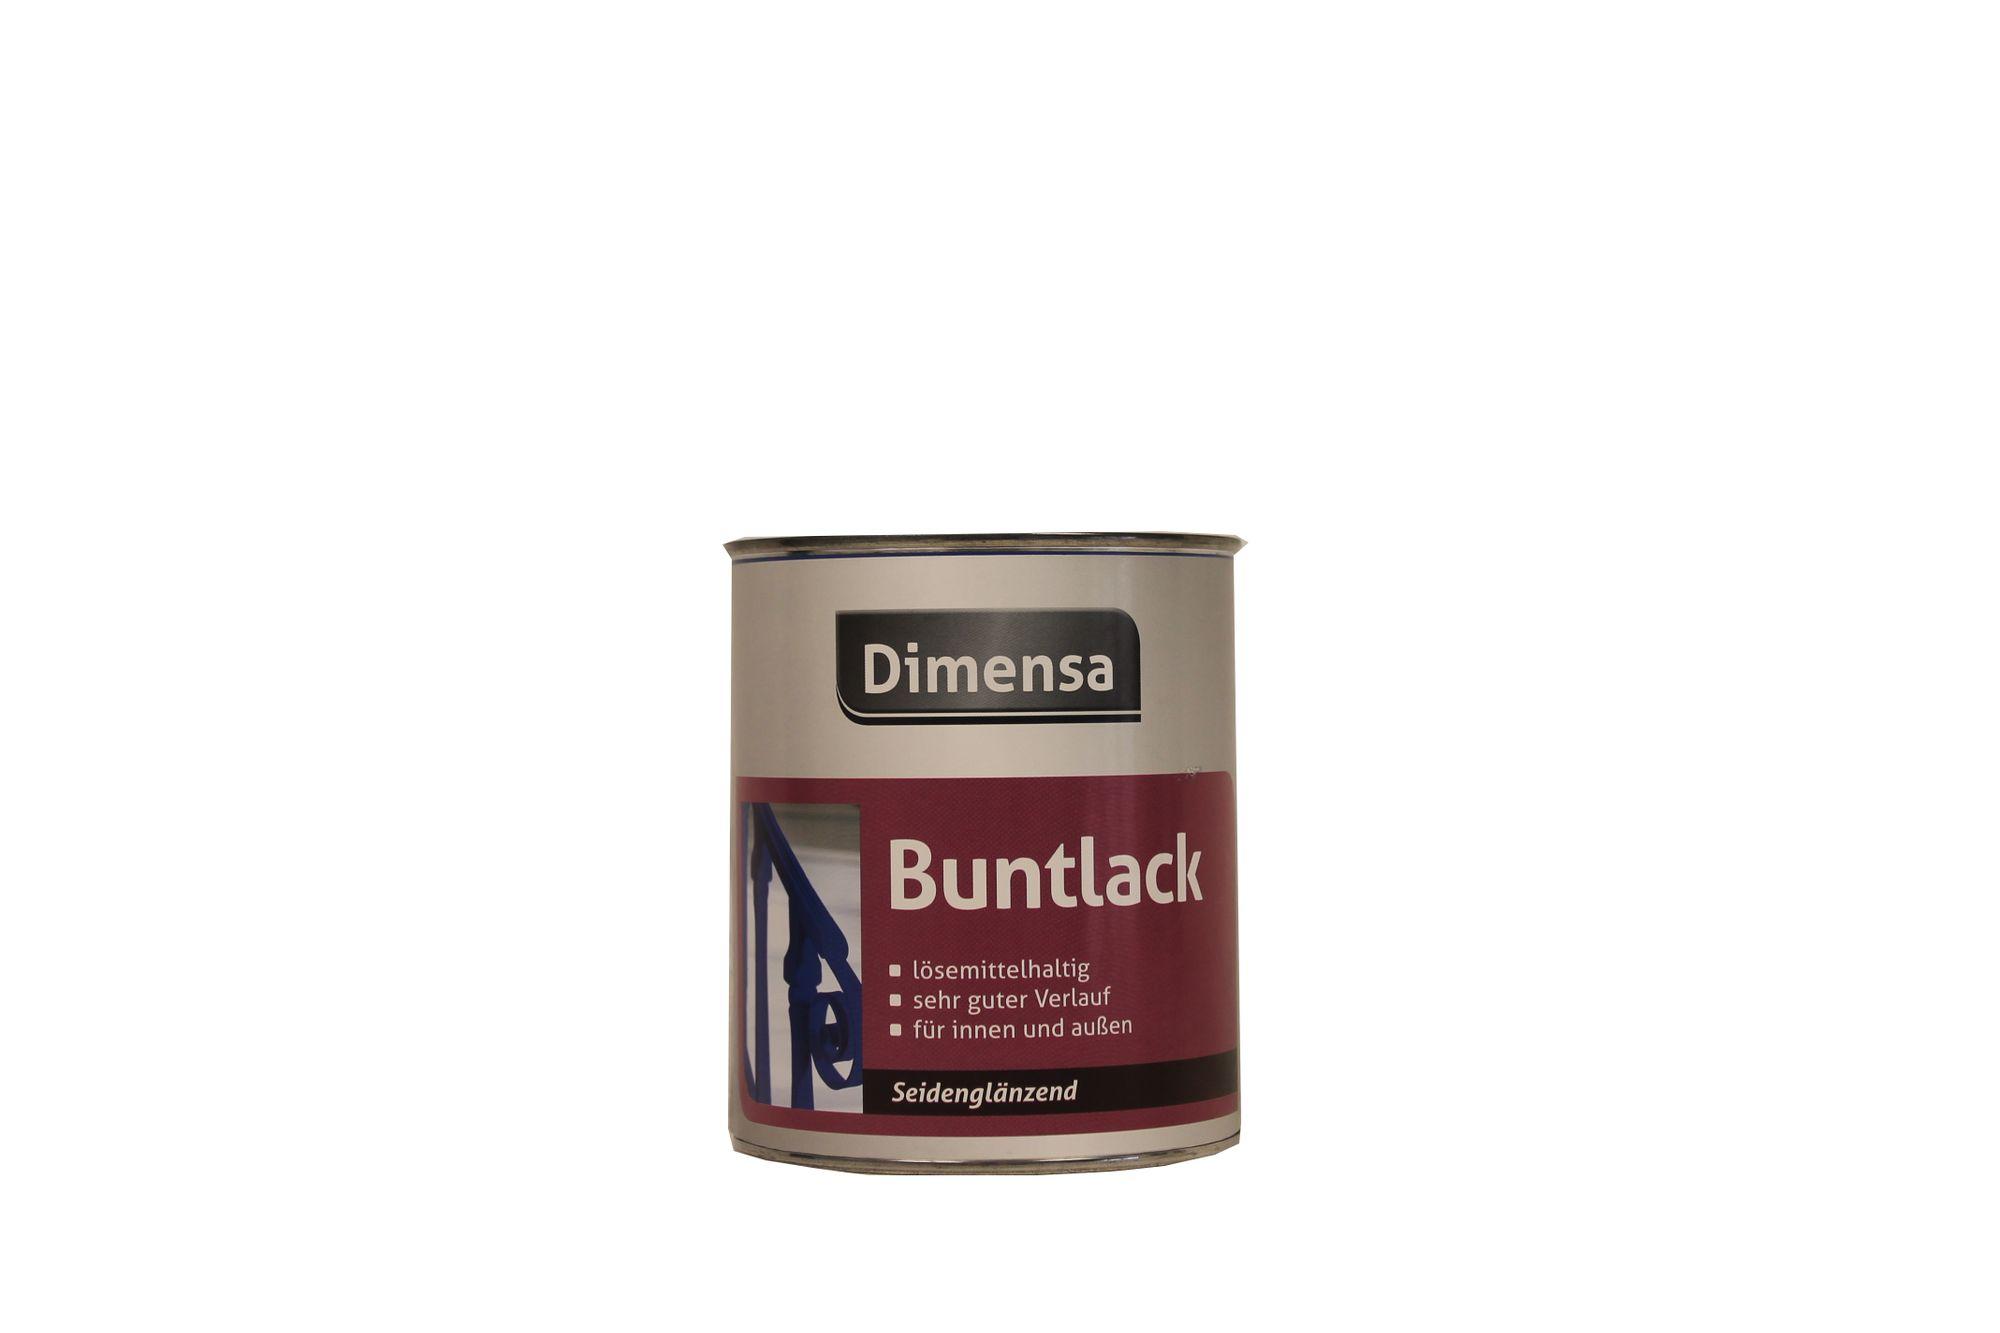 Dimensa Buntlack lösemittelhaltig  Seidenglänzend 750 ml Farbwahl